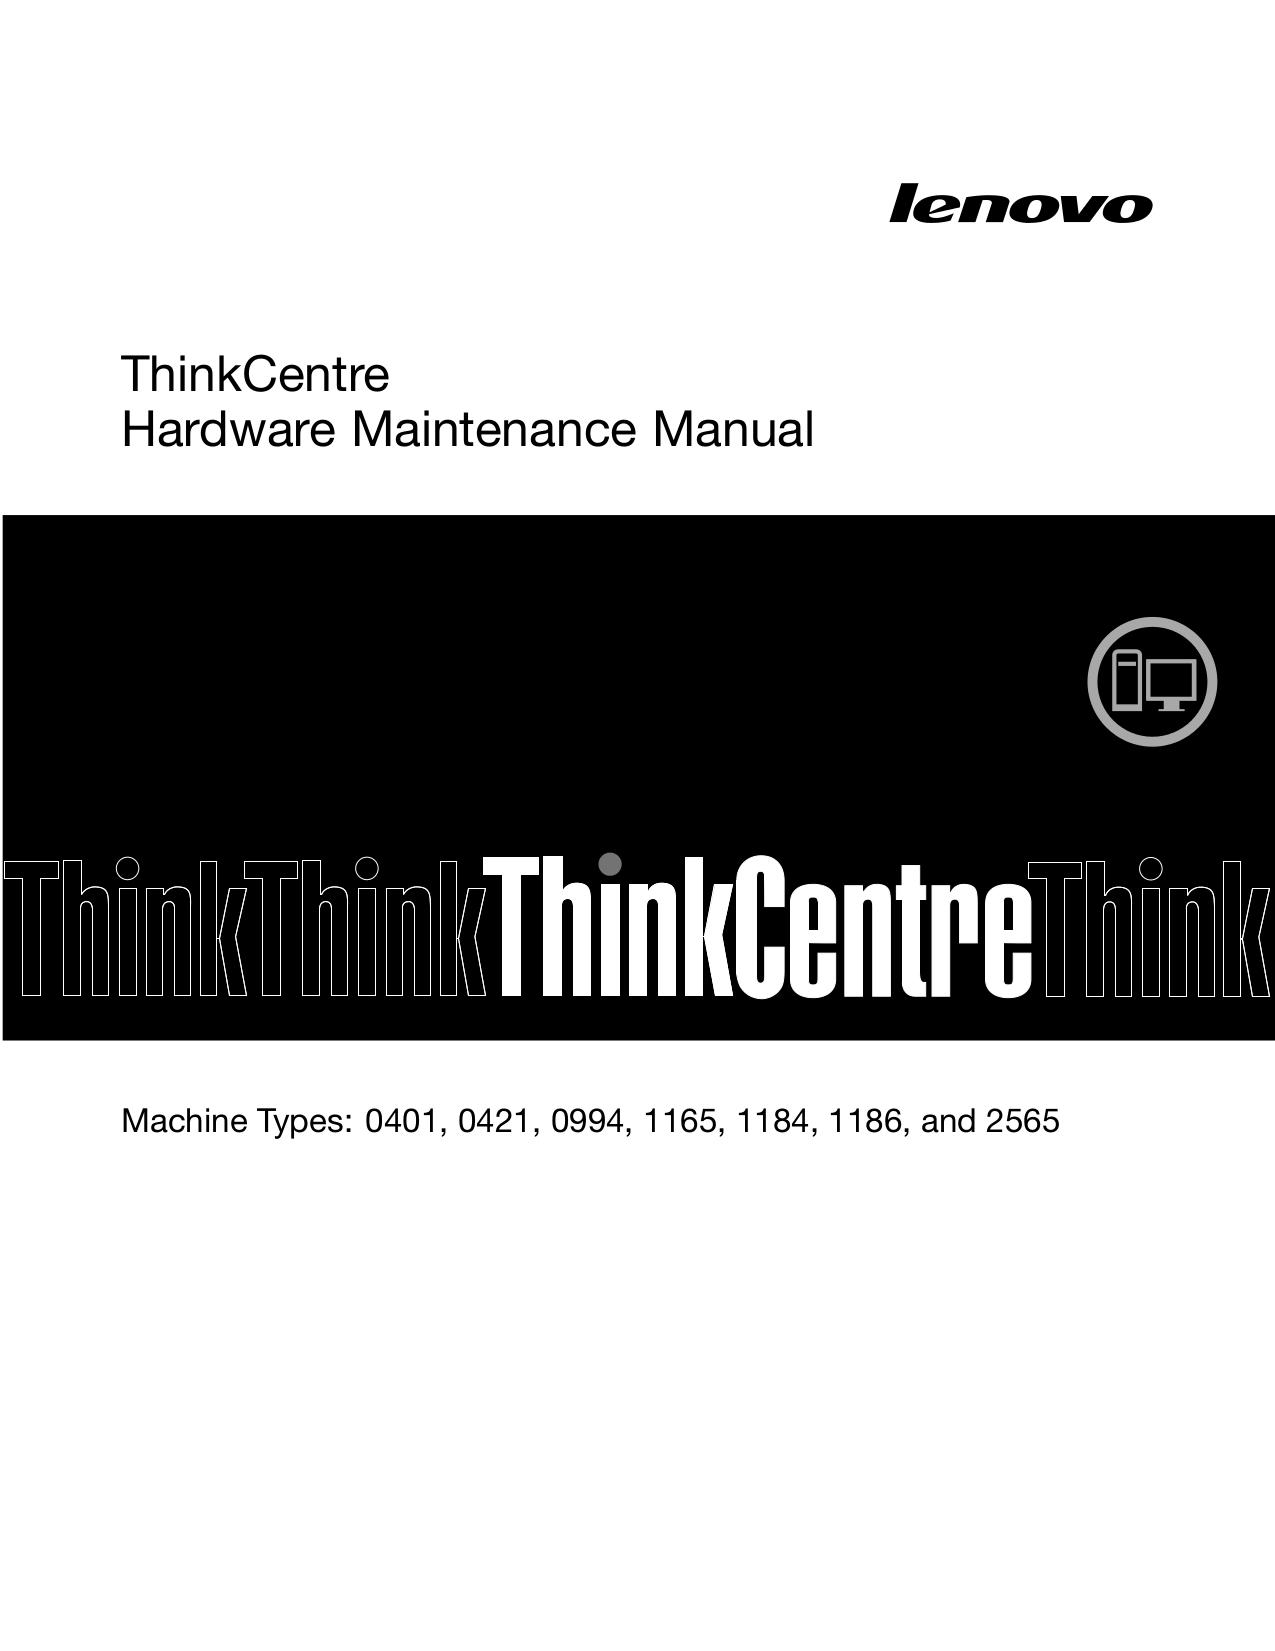 pdf for Lenovo Desktop ThinkCentre A70z 0401 manual